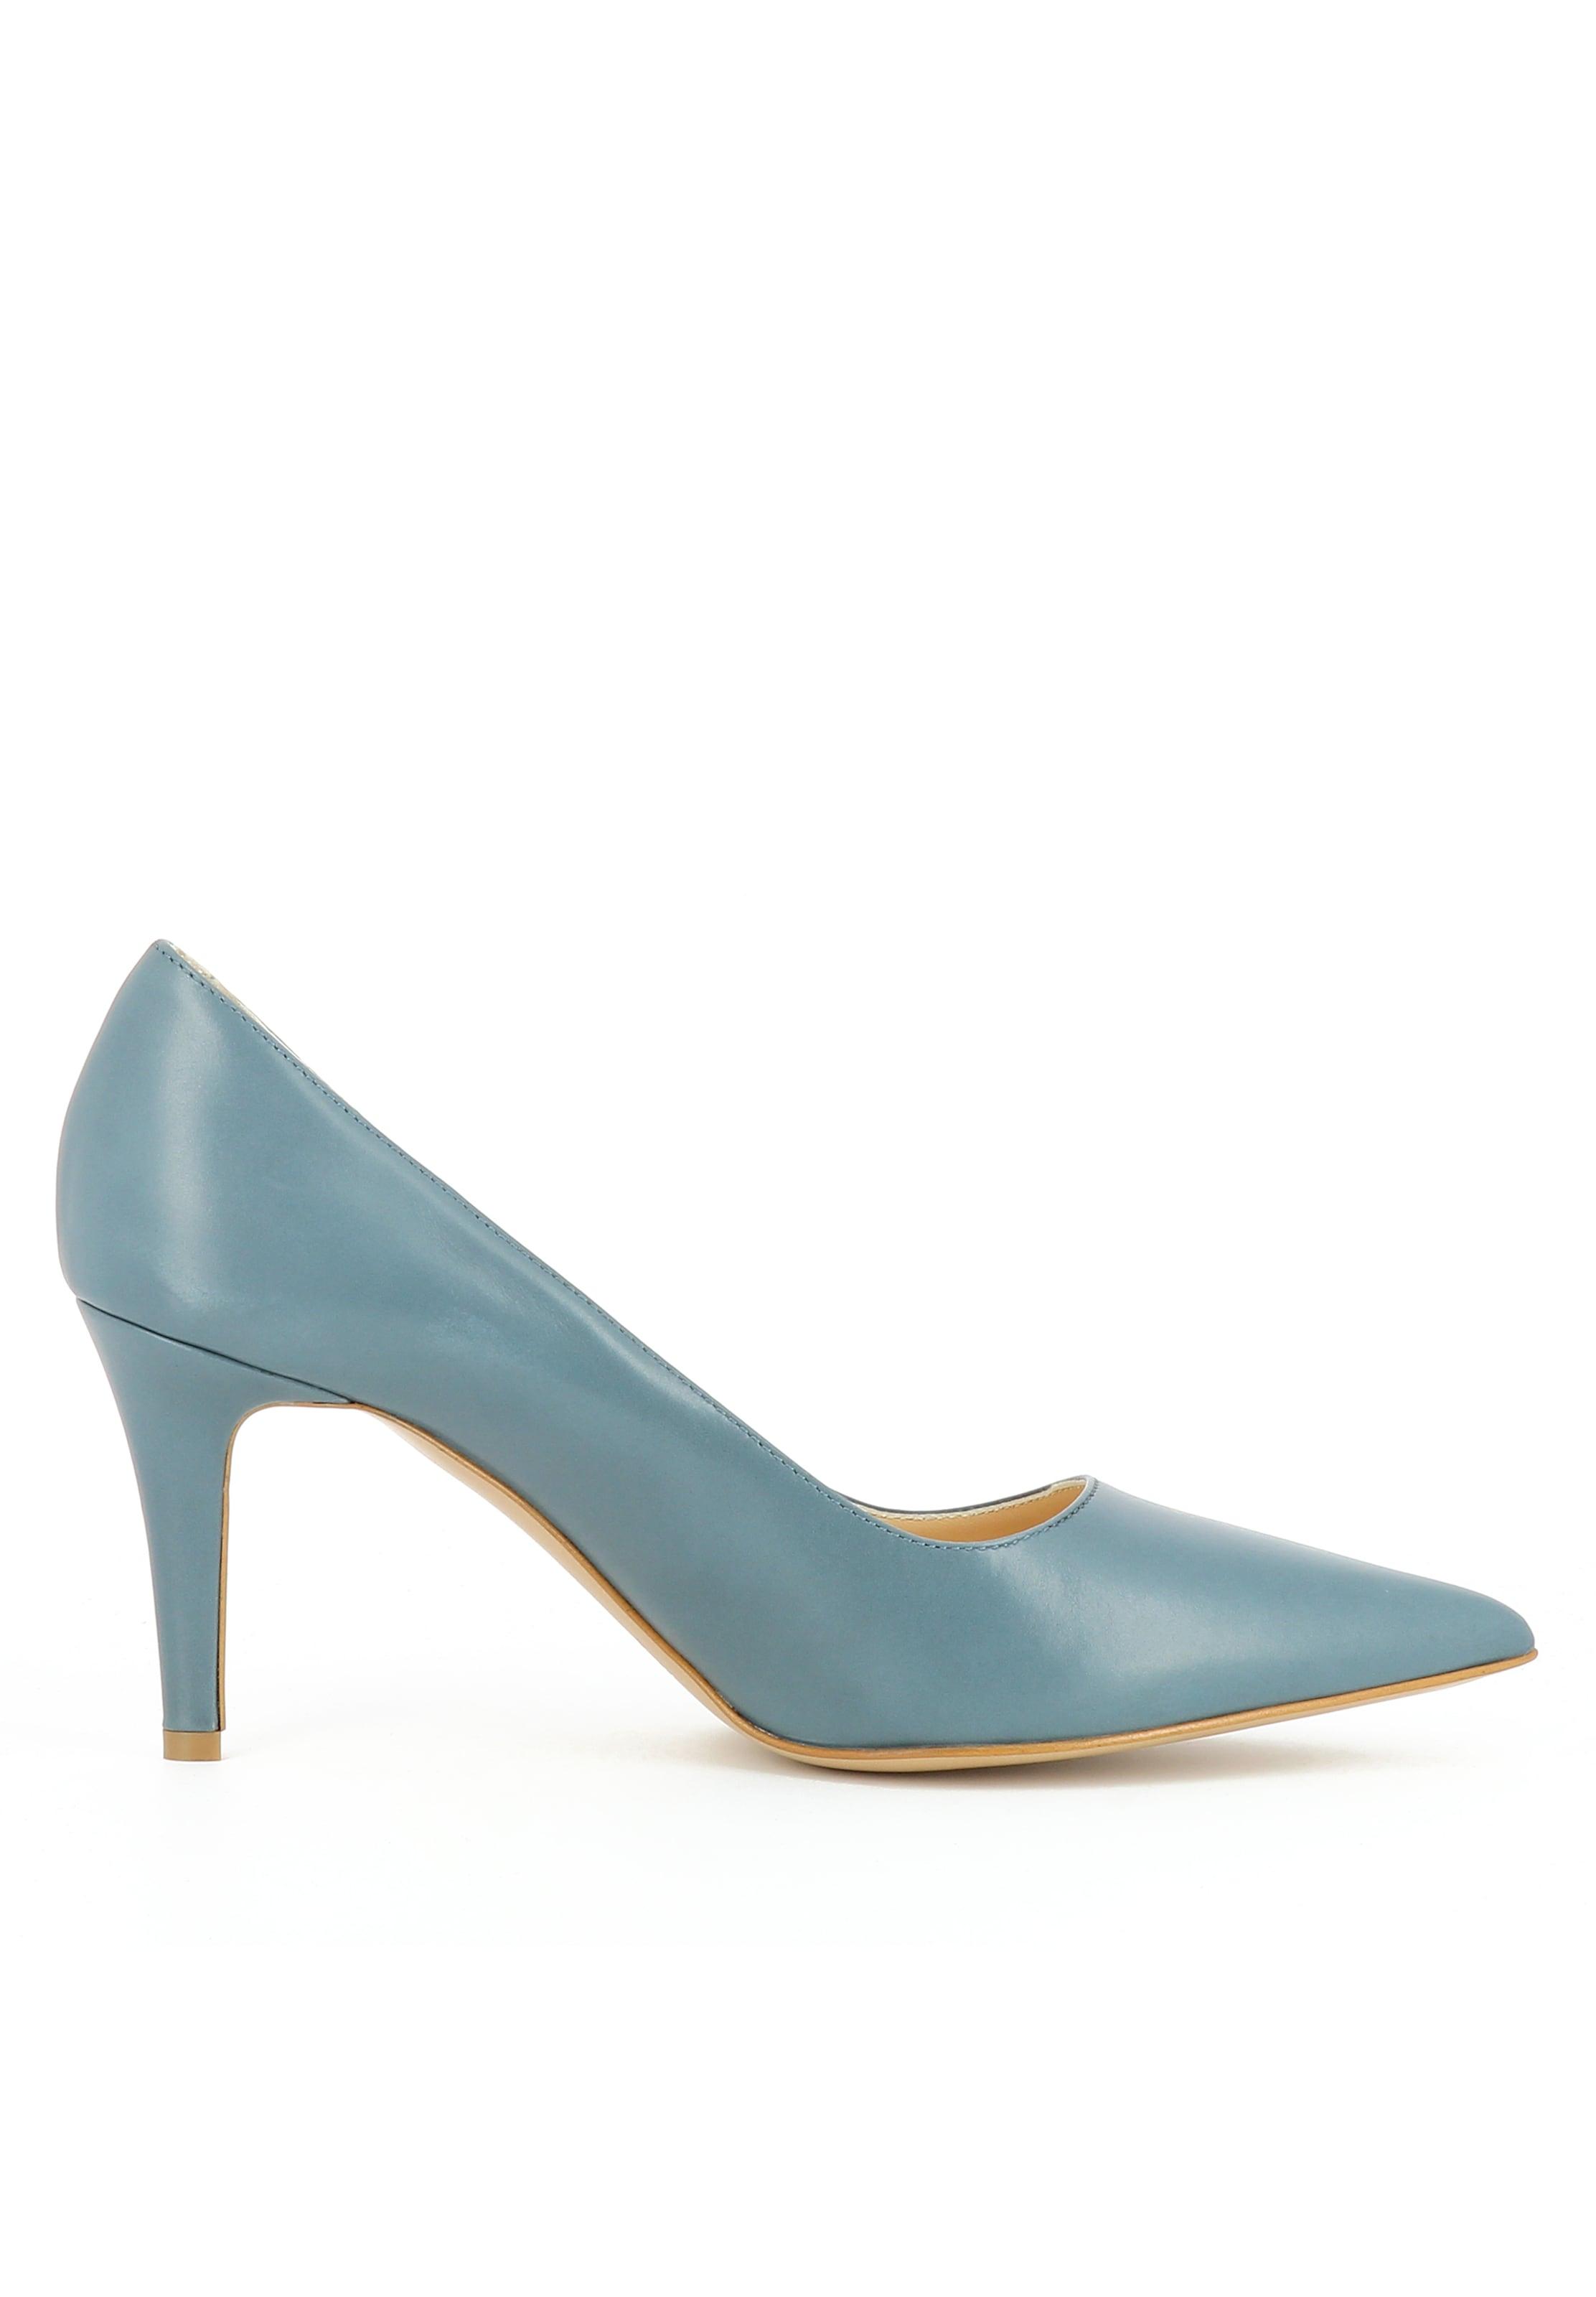 'jessica' Clair Escarpins En Bleu Evita fgmIY6yvb7